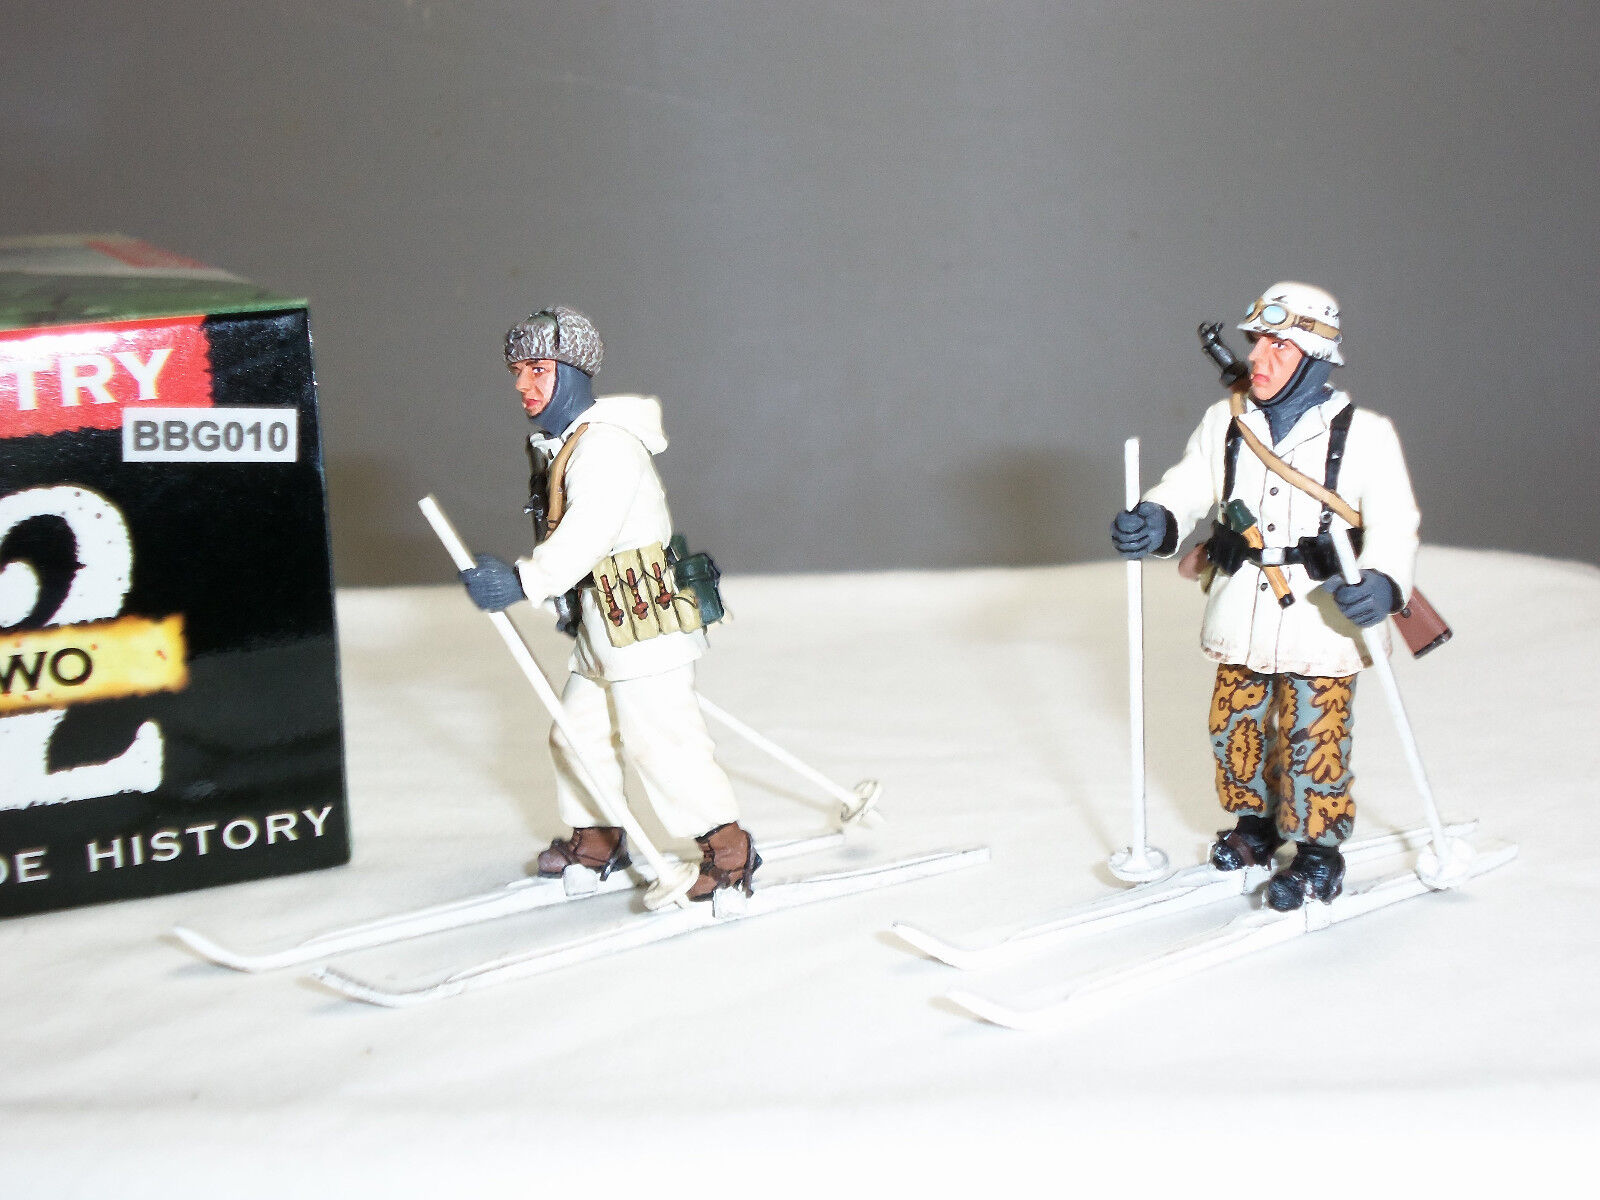 KING AND COUNTRY BBG10 GERMAN ALPINA WINTER SKI TROOPERS METAL TOY SOLDIER SET